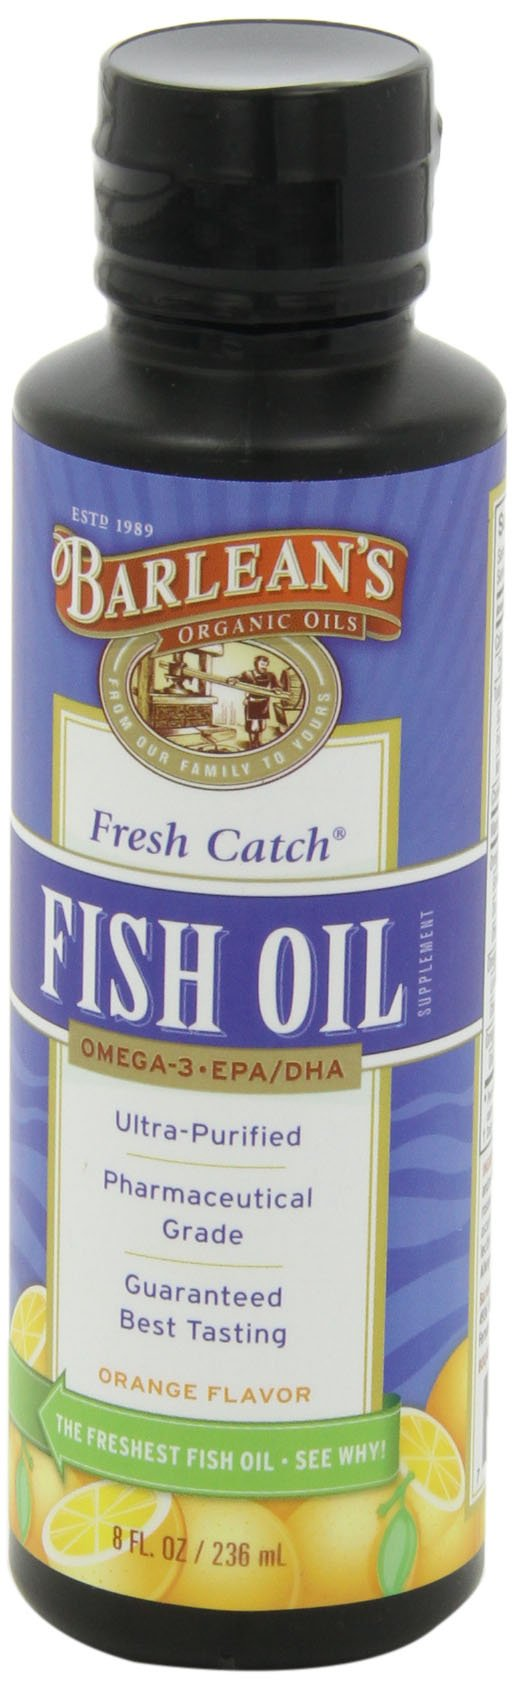 Barlean's Organic Oils Fresh Catch Fish Oil, Orange Flavor, 8-Ounce Bottle